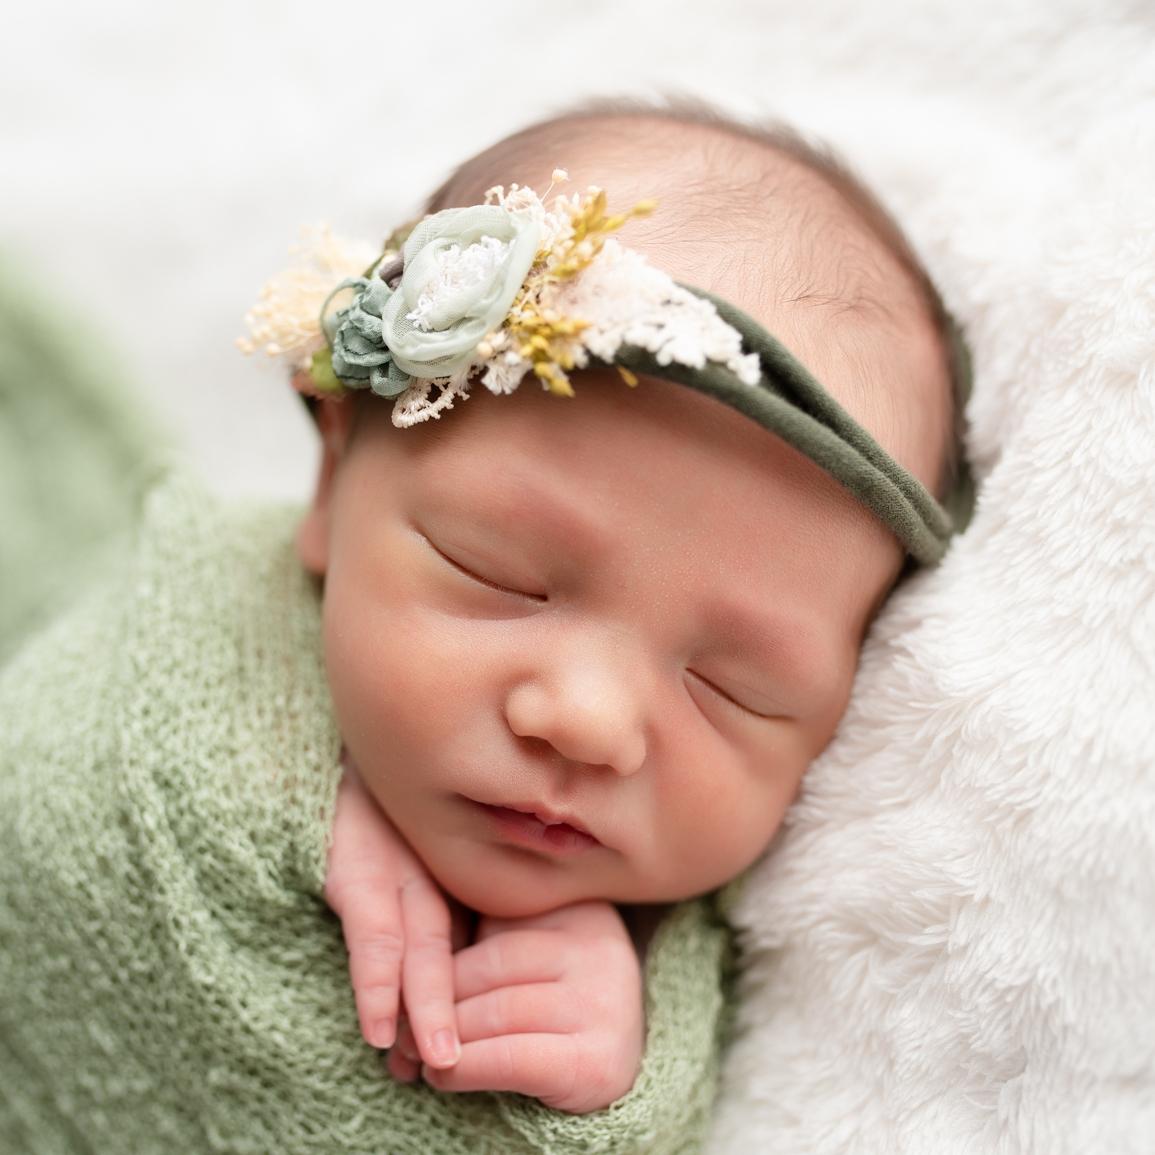 somerville-newborn-family-photography-2.jpg